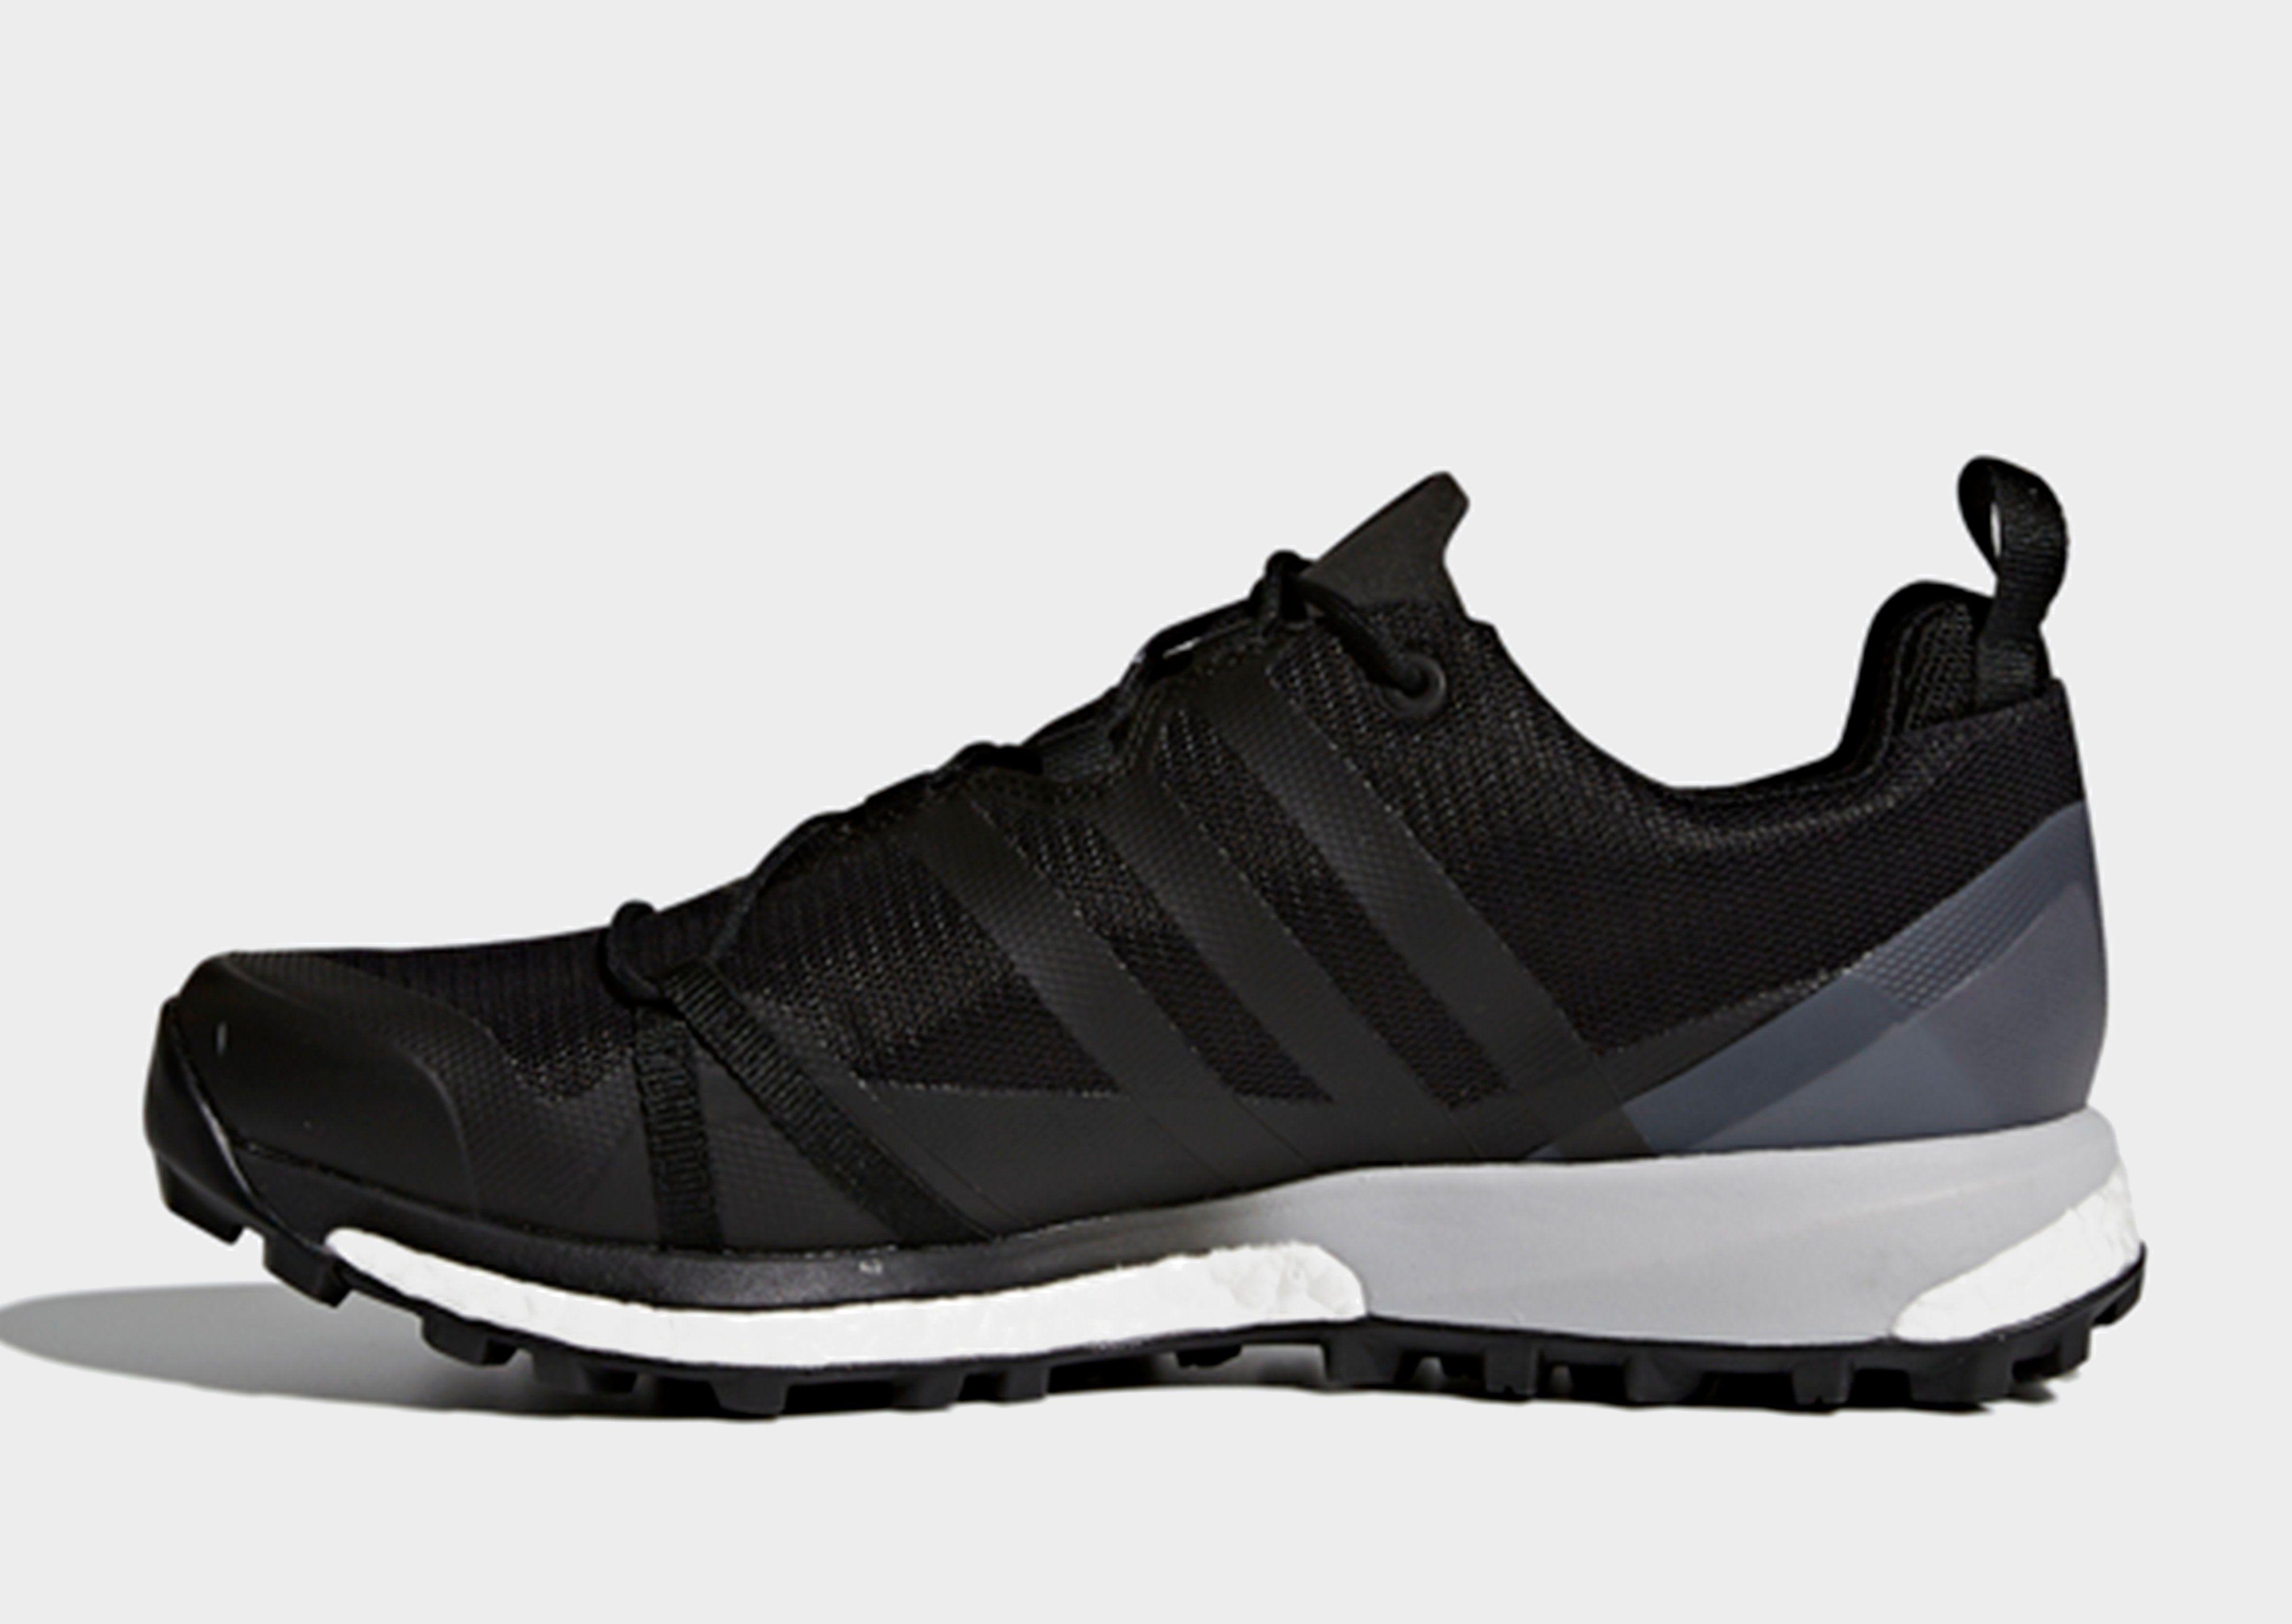 uk availability 9f01d 4c634 ADIDAS Terrex Agravic GTX Shoes  JD Sports